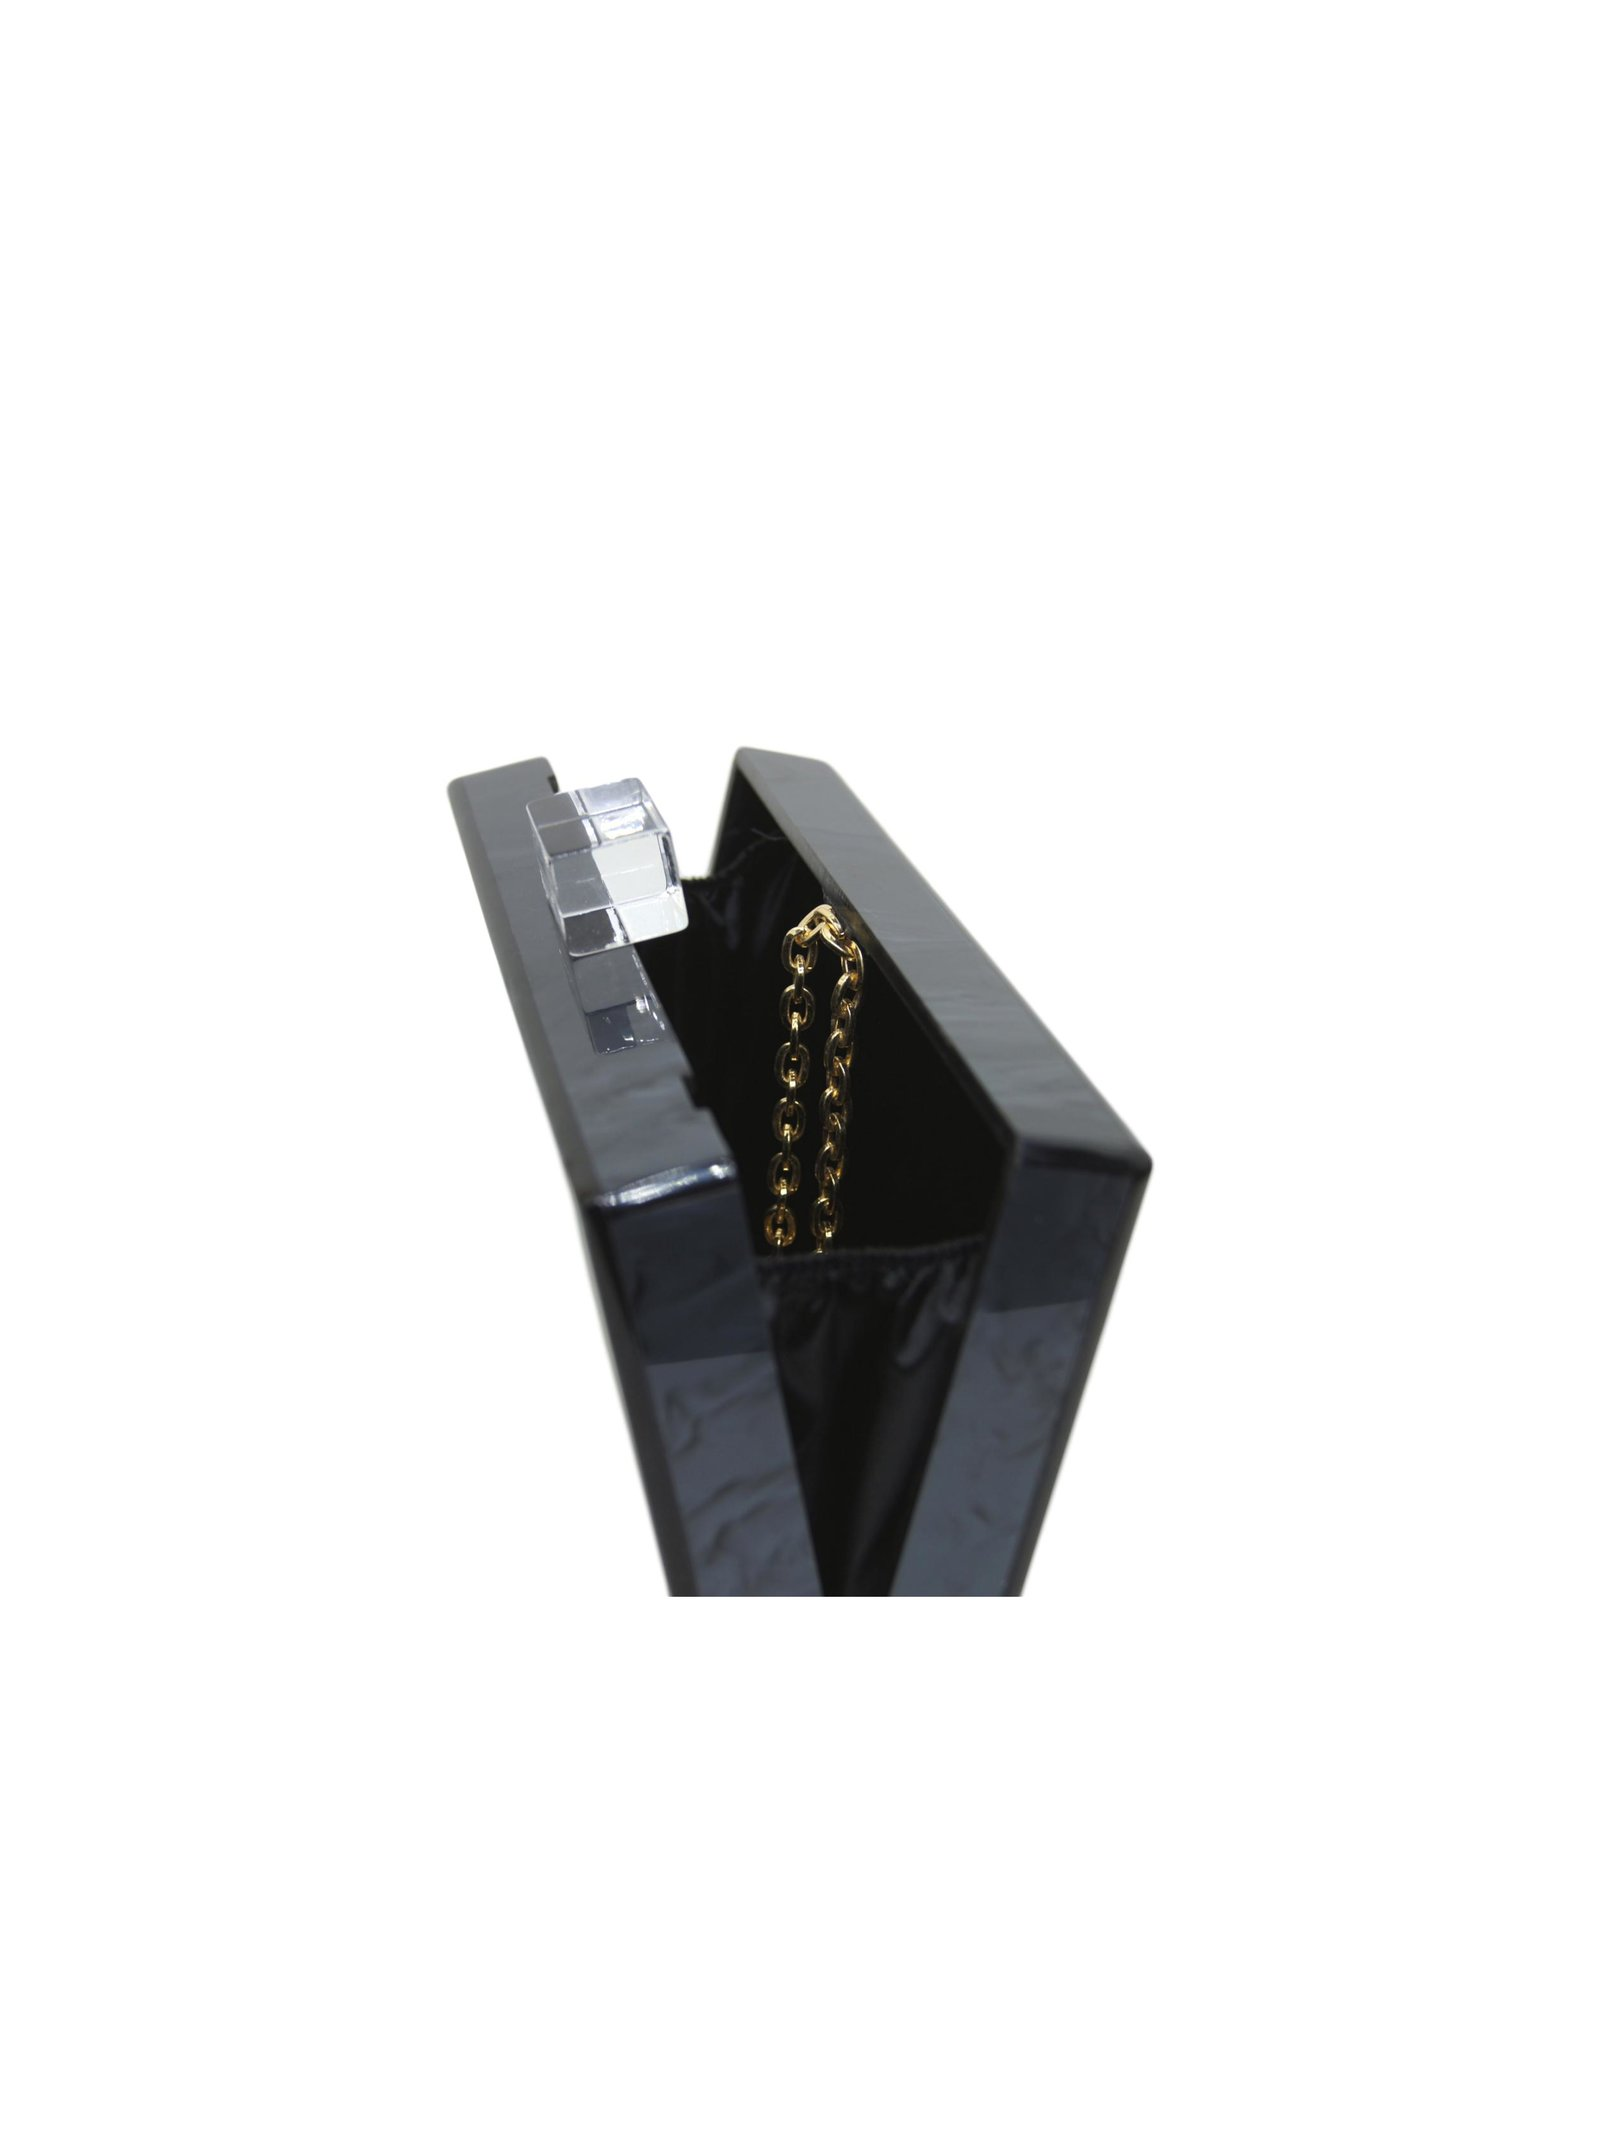 Milanblocks Metallic Charcoal Acrylic Box Clutch